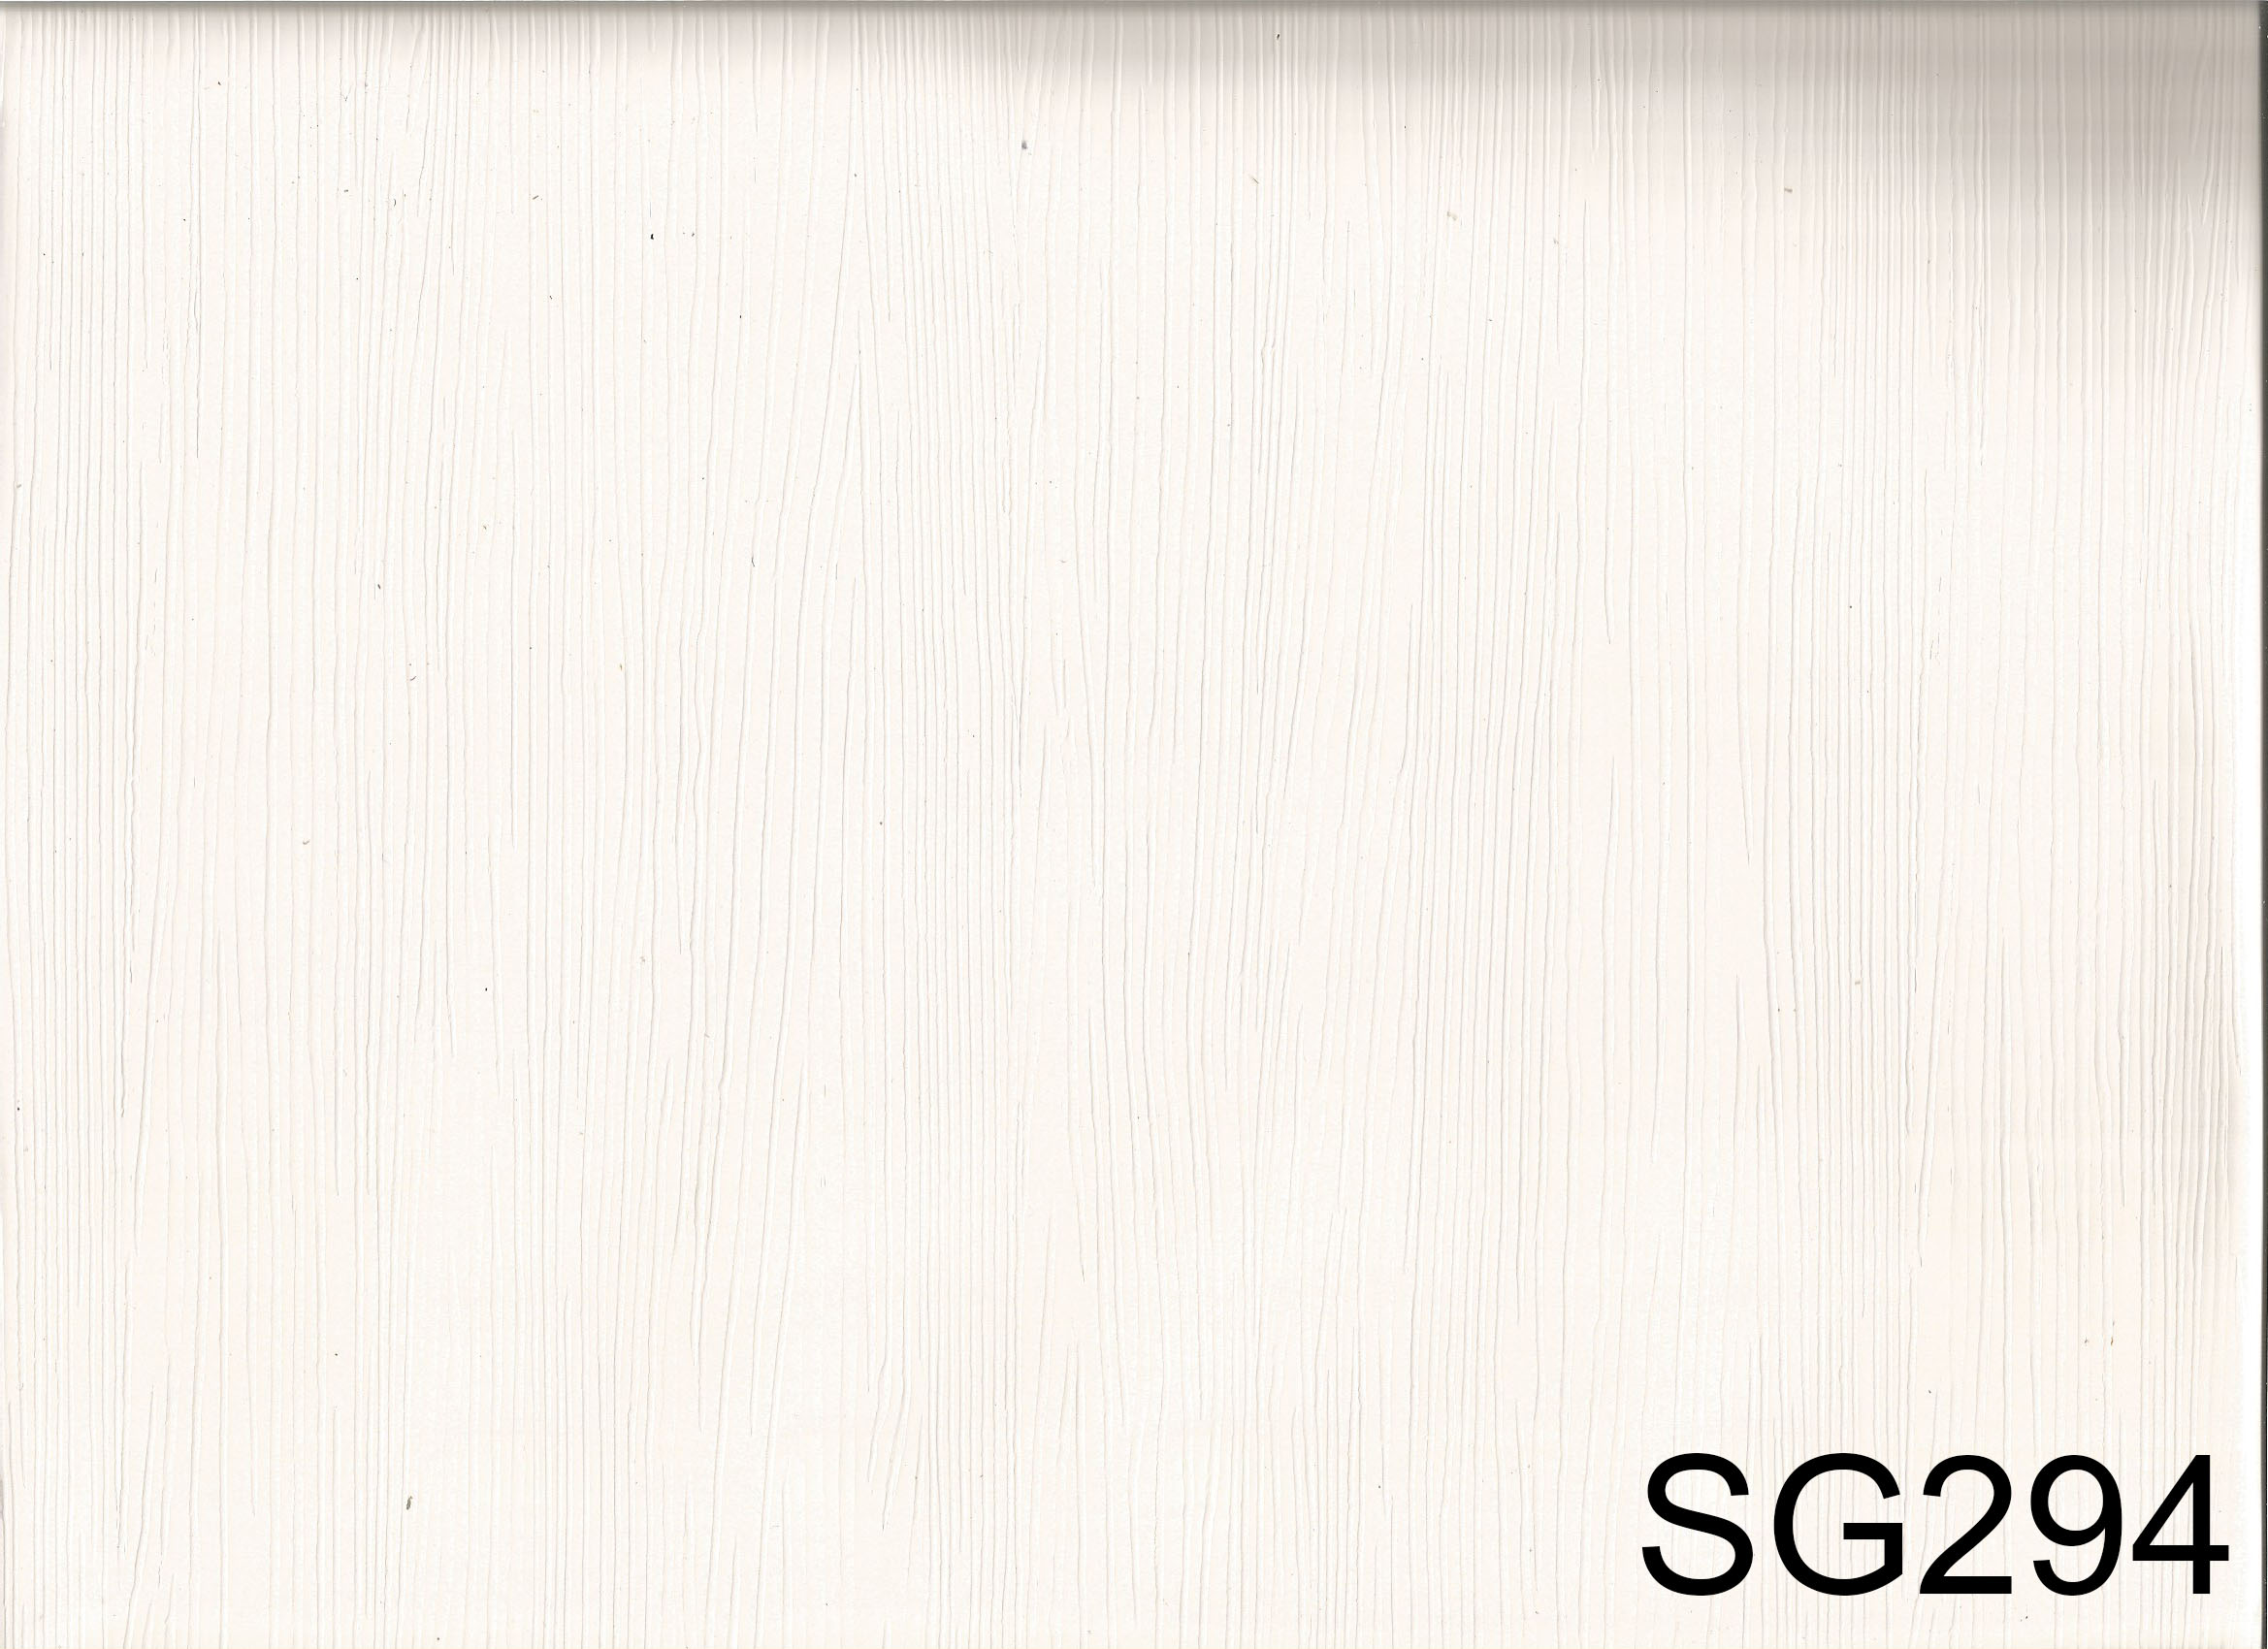 SG294